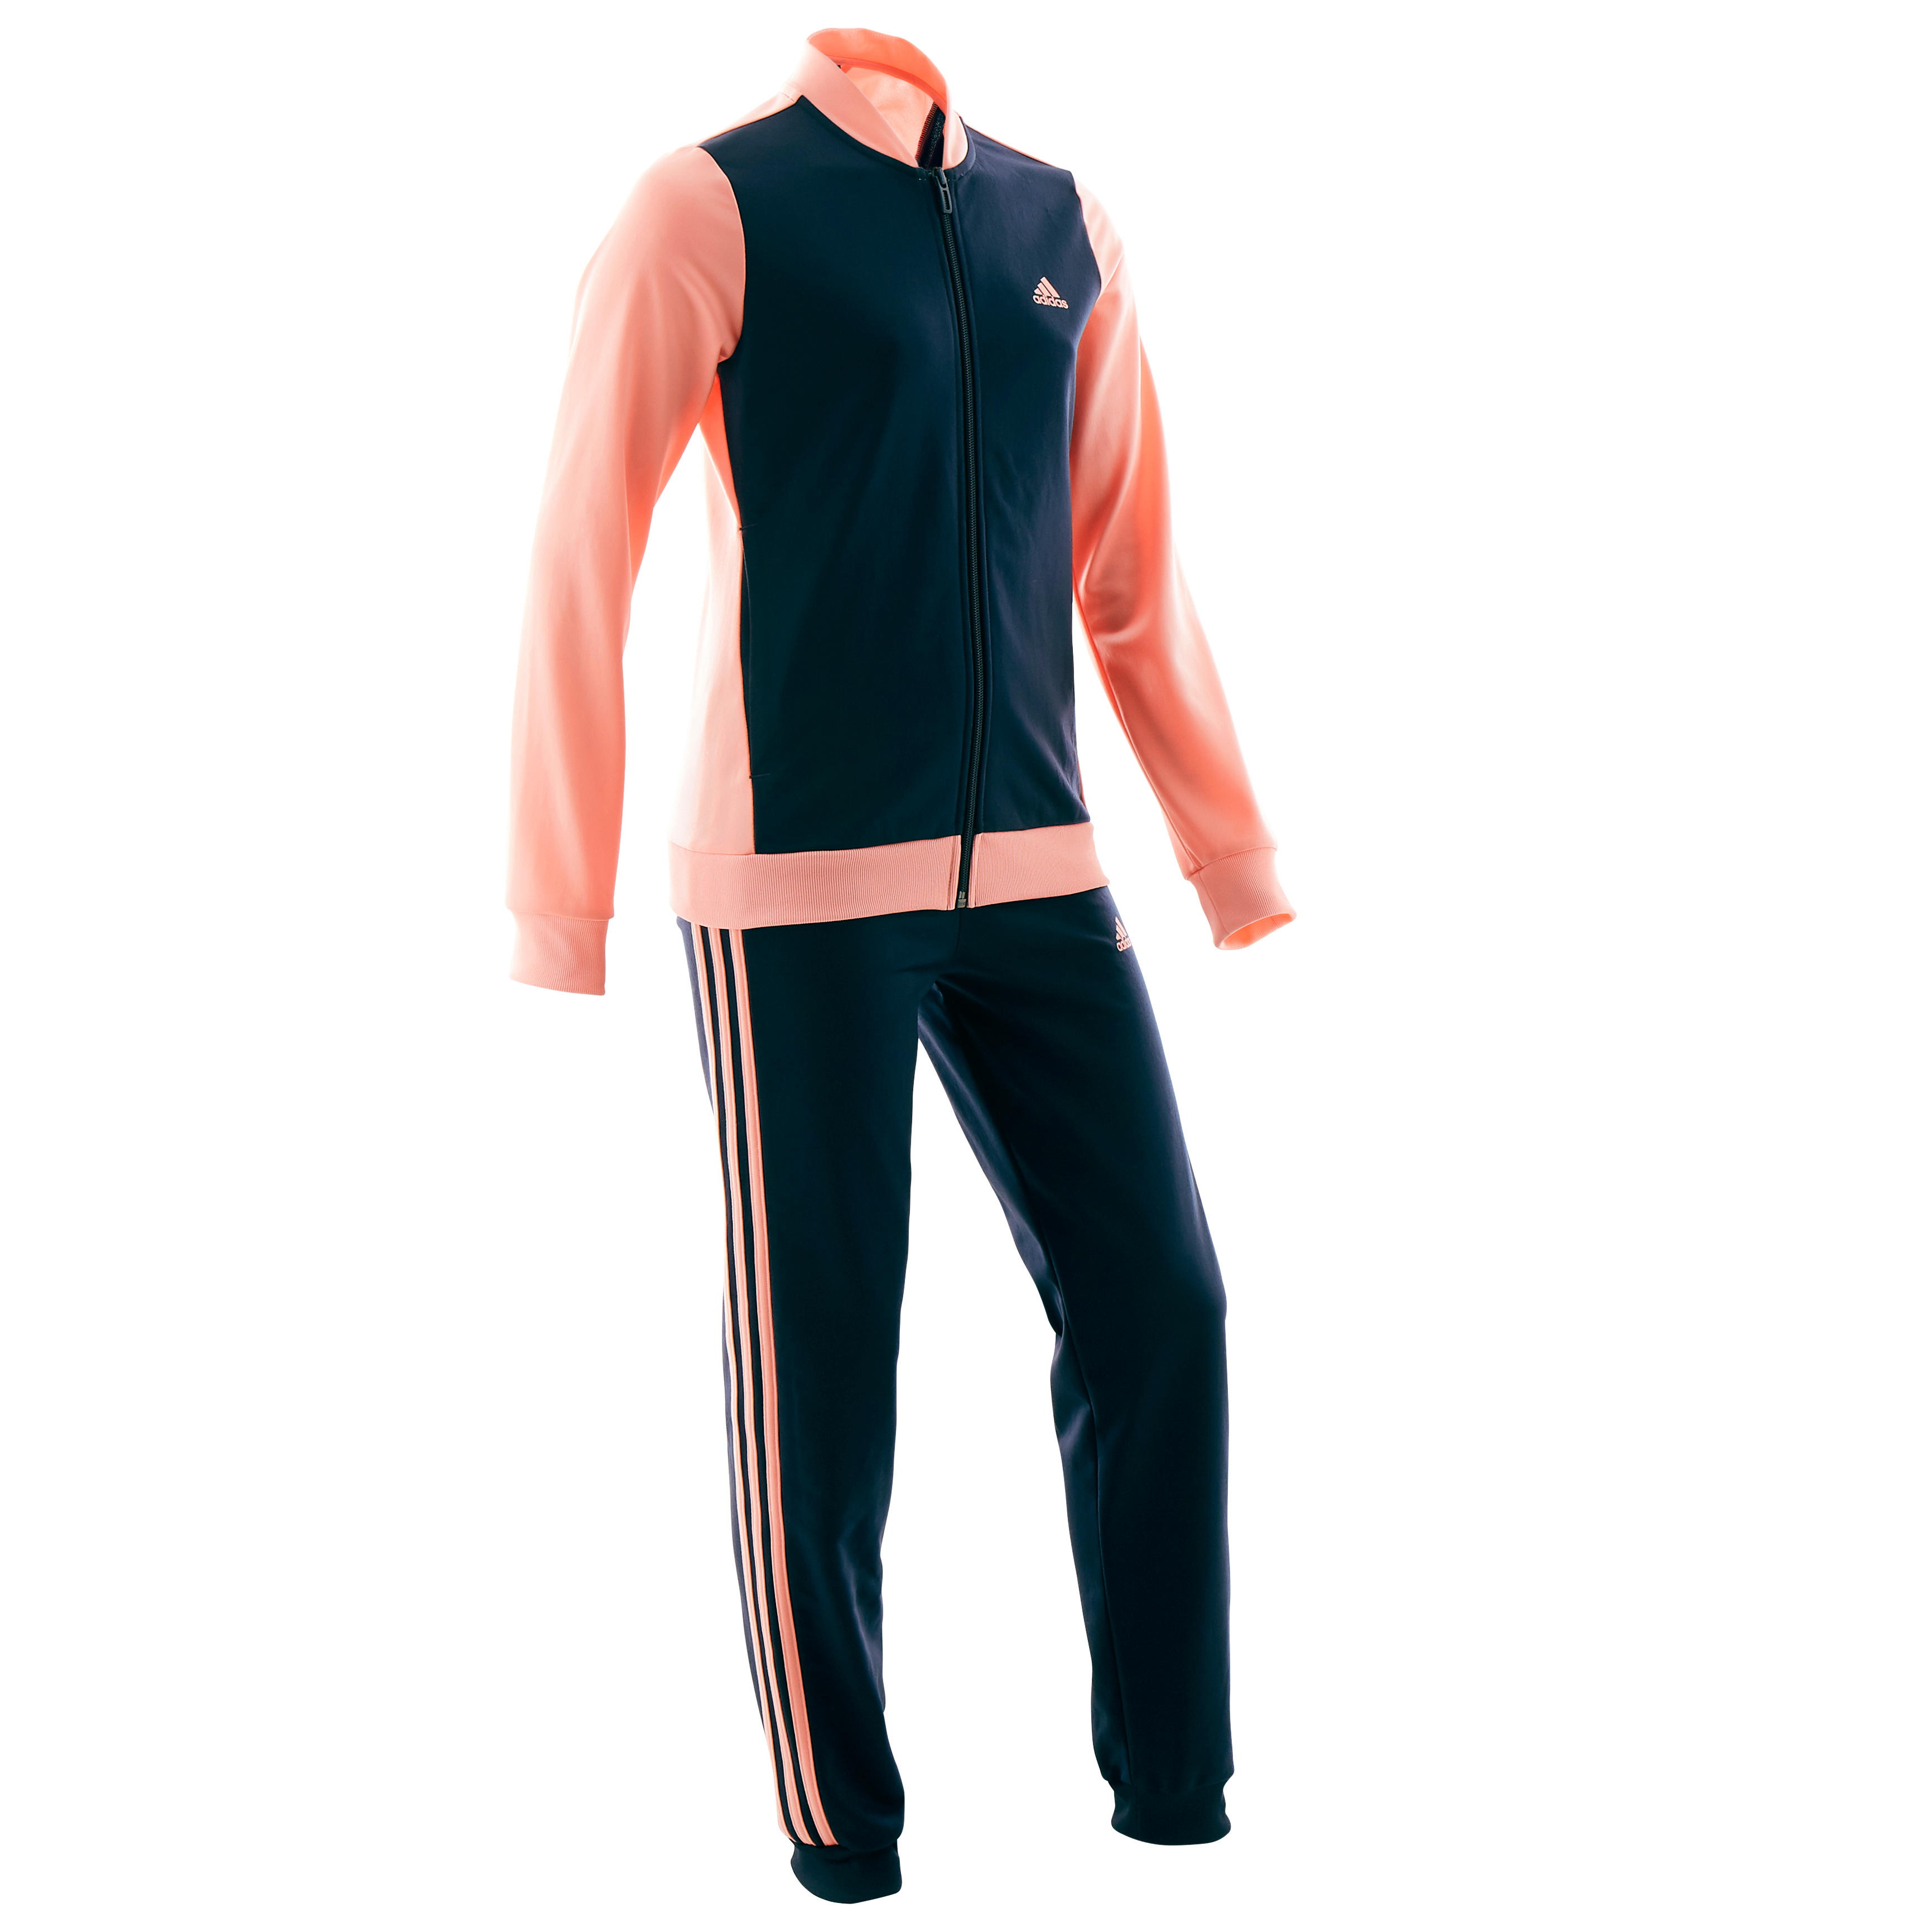 Trening Adidas roz fete